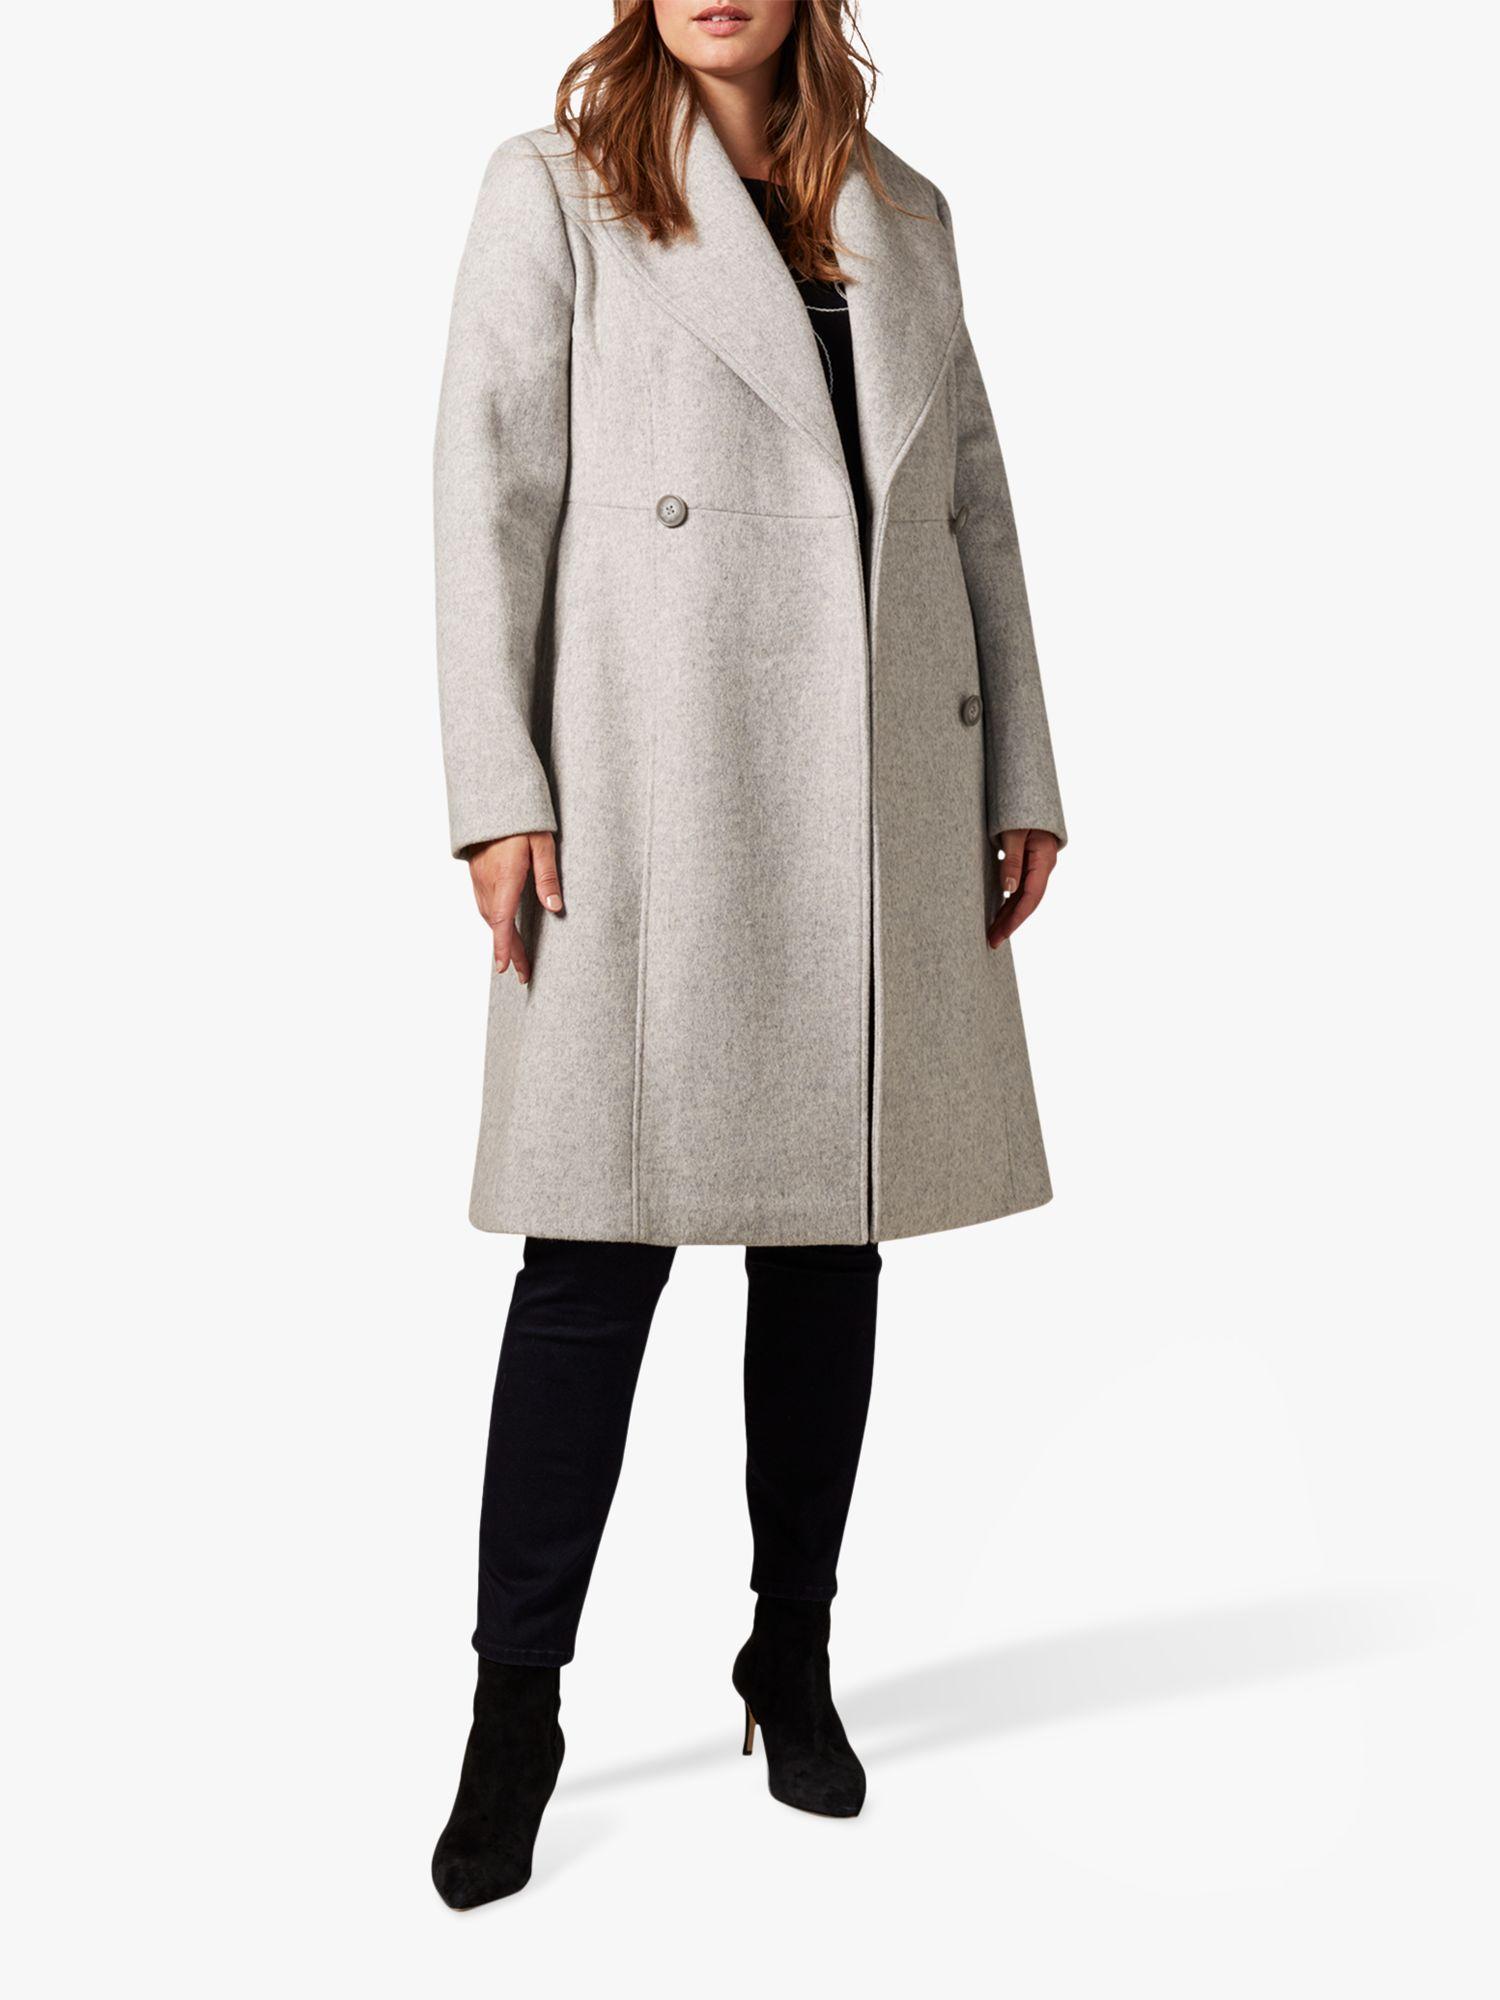 Studio 8 Studio 8 Ayda Wool Blend Coat, Grey